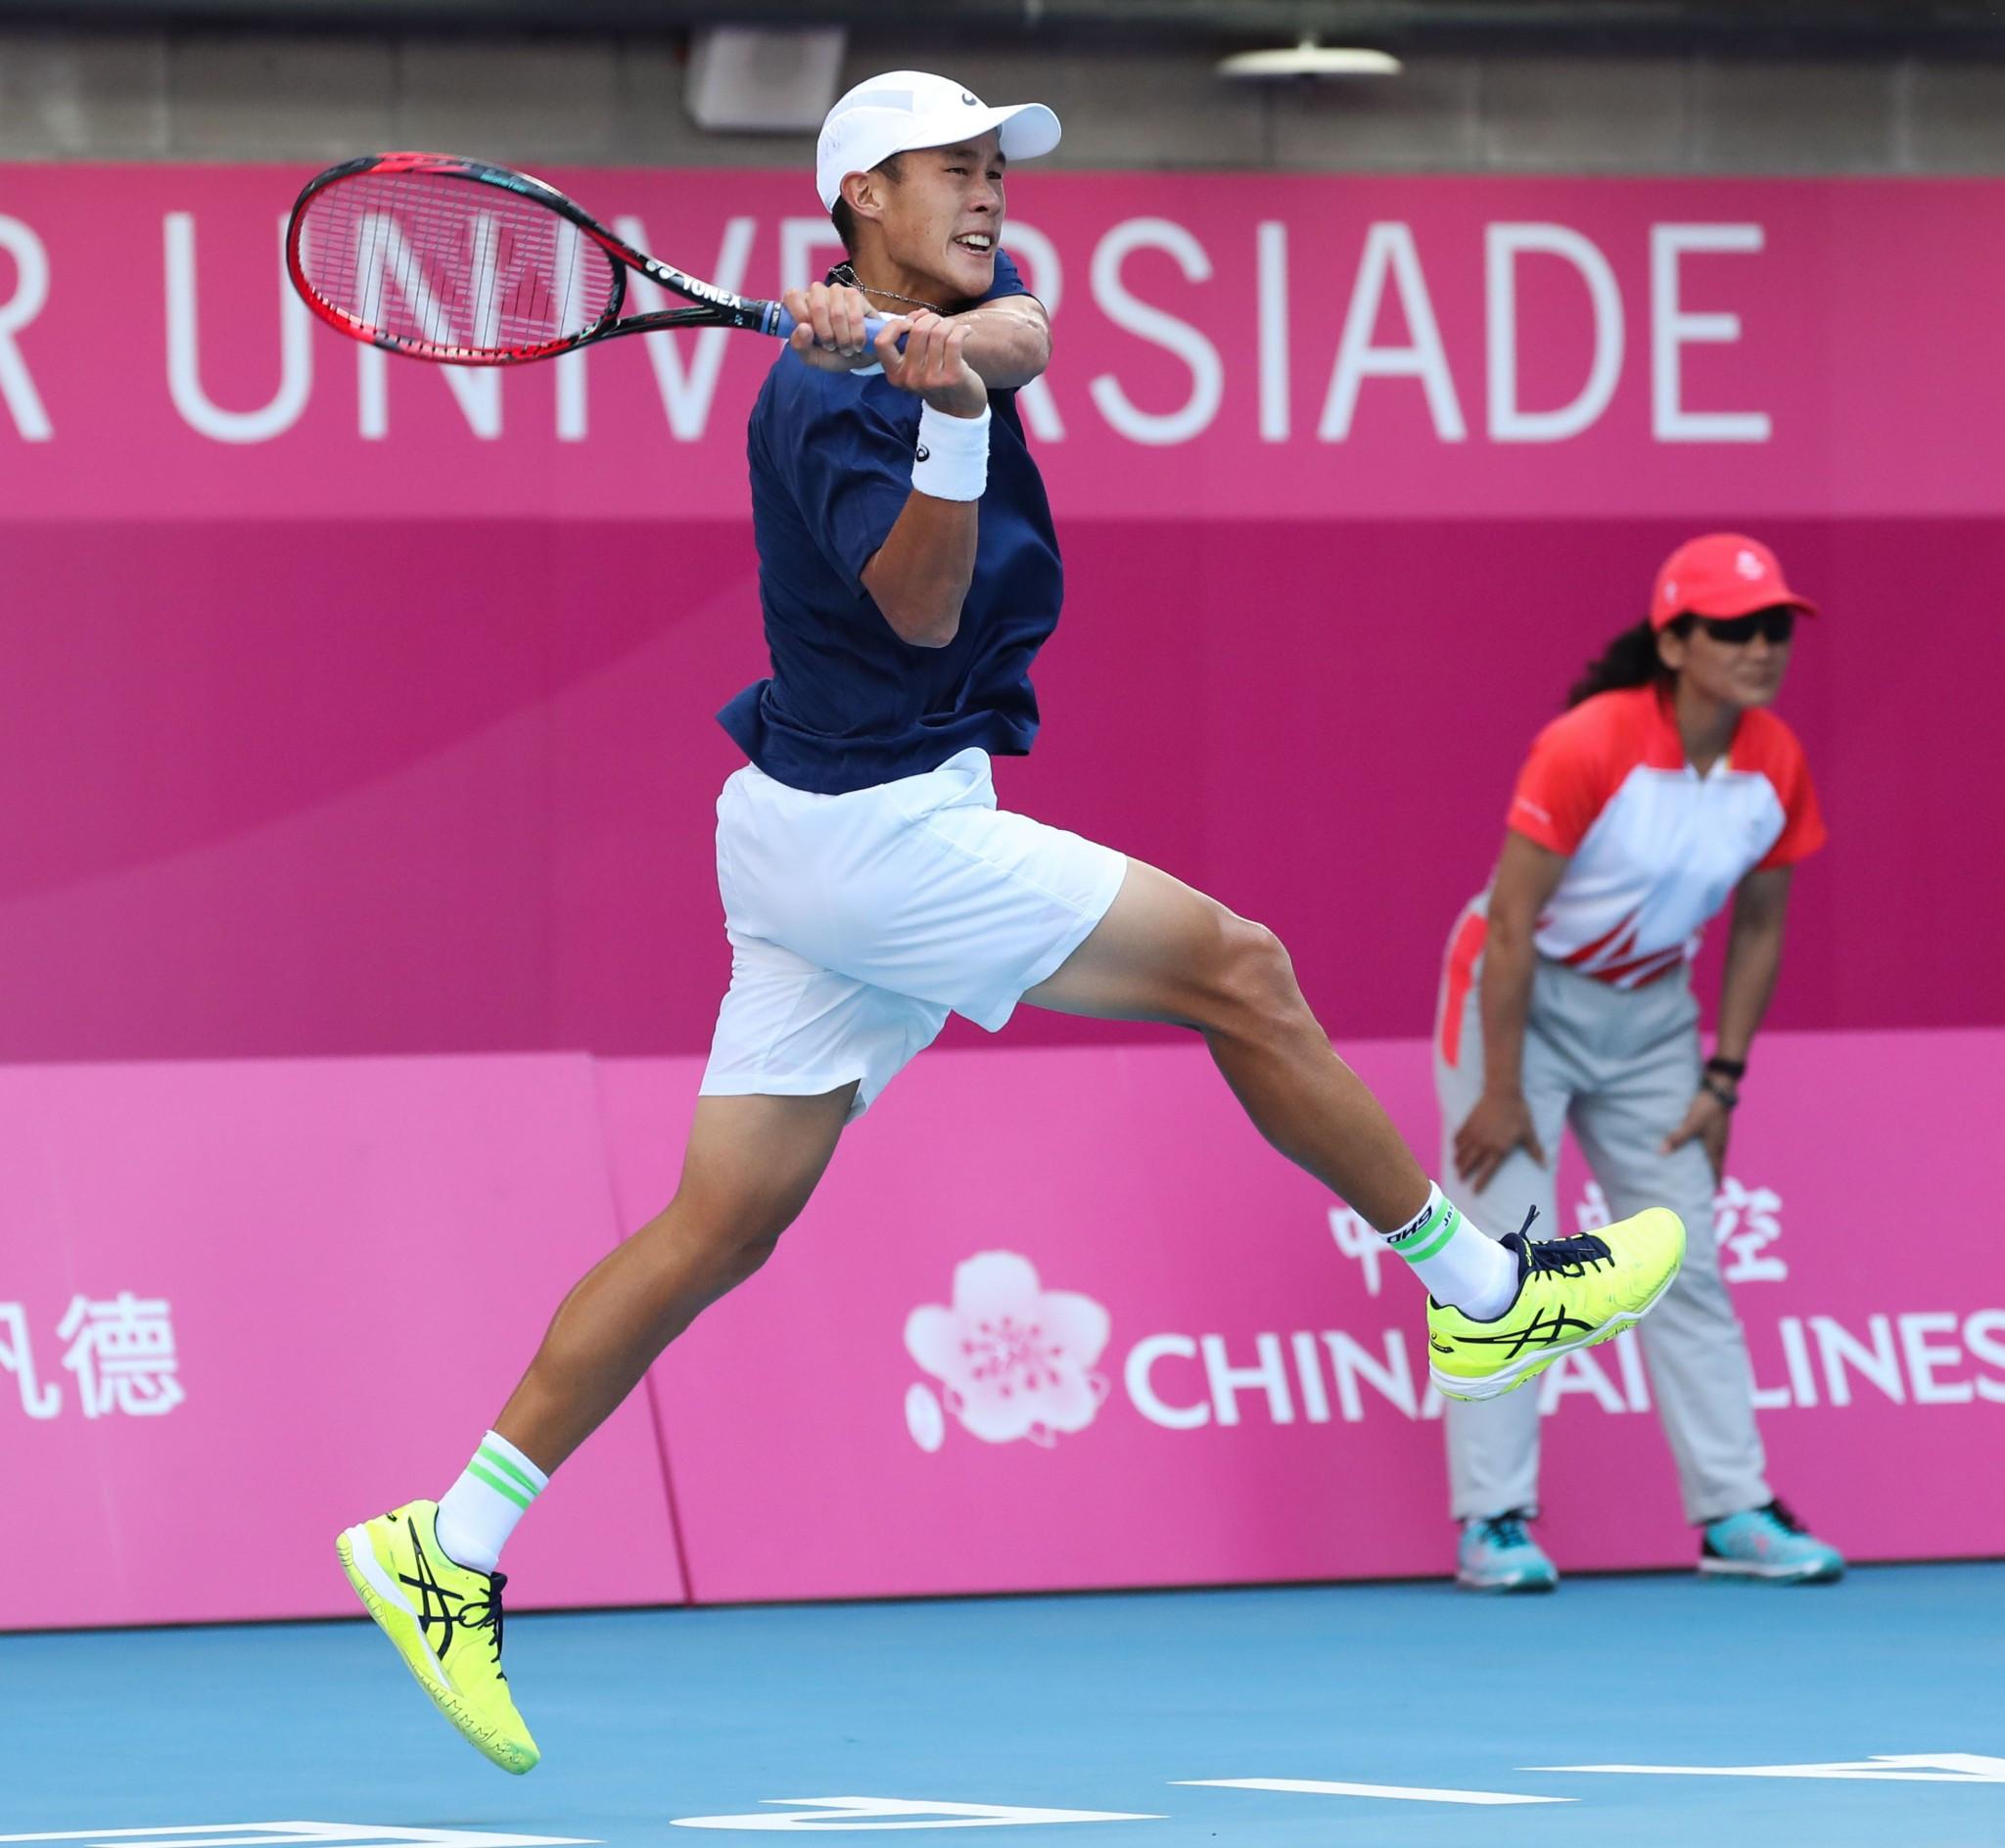 Chinese Taipei's Jason Jung won the men's tennis singles gold medal ©Taipei 2017